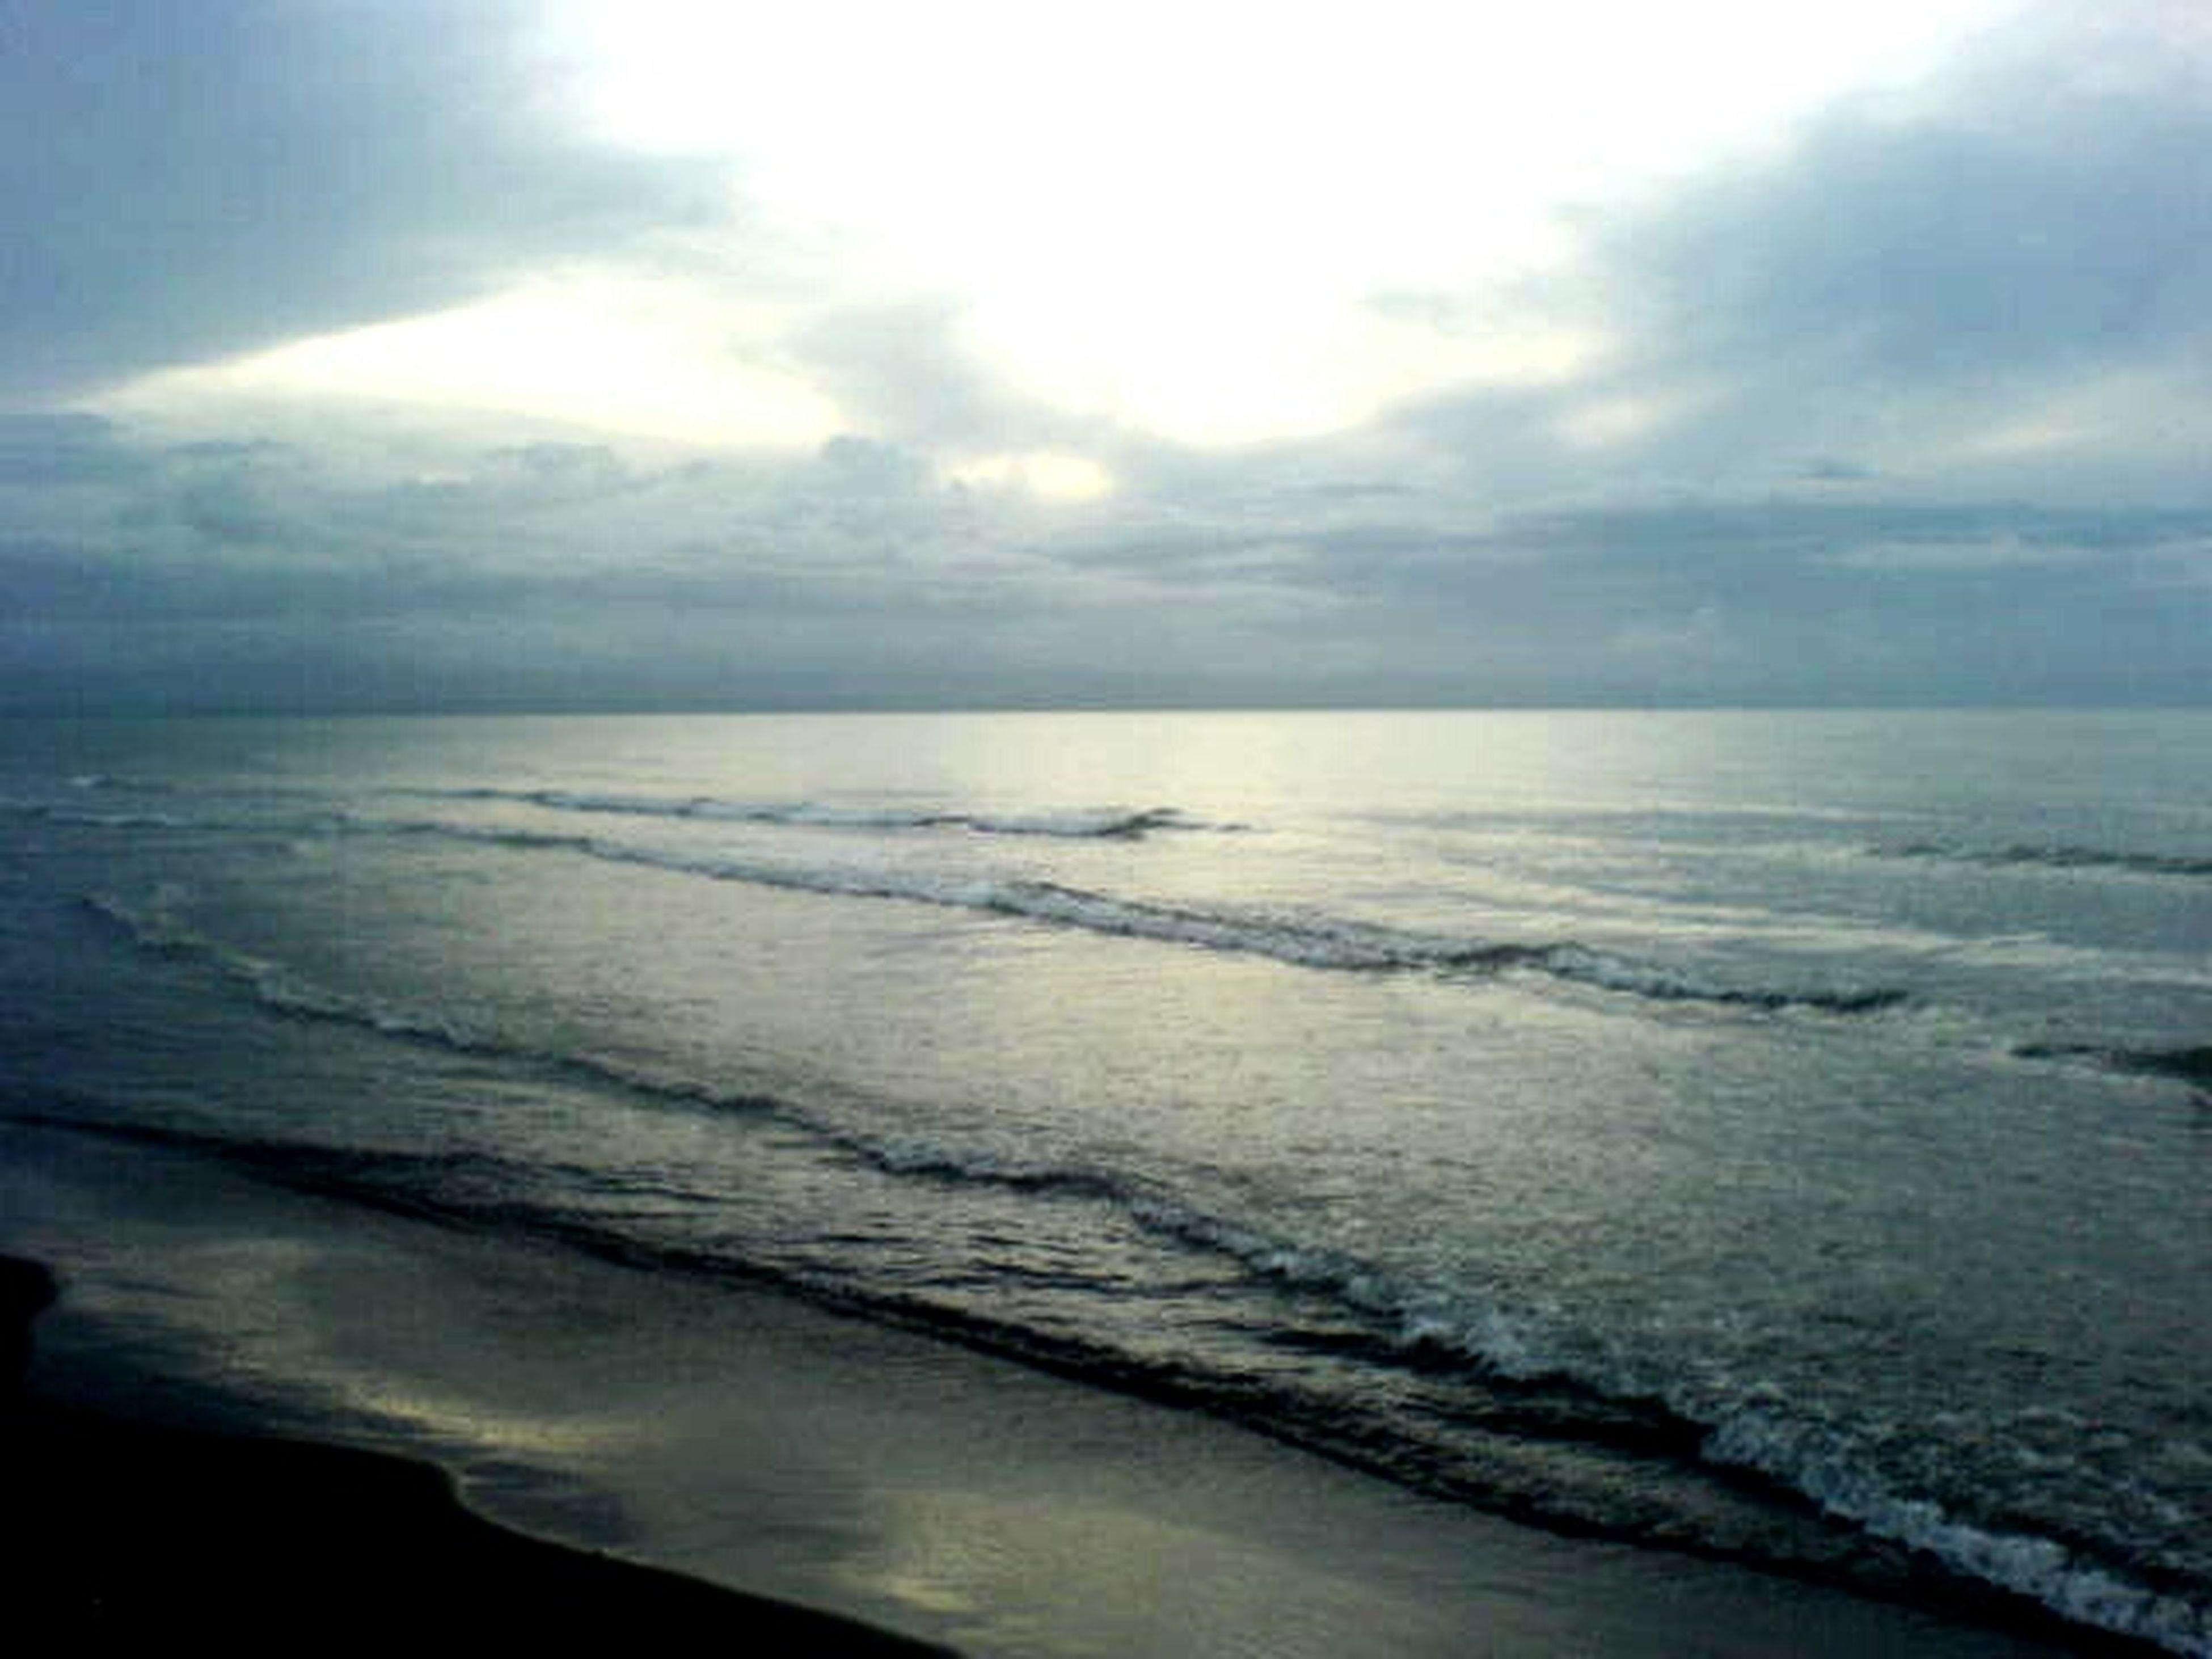 sea, horizon over water, water, sky, beach, tranquil scene, scenics, tranquility, beauty in nature, cloud - sky, shore, nature, cloudy, idyllic, cloud, wave, sand, calm, coastline, seascape